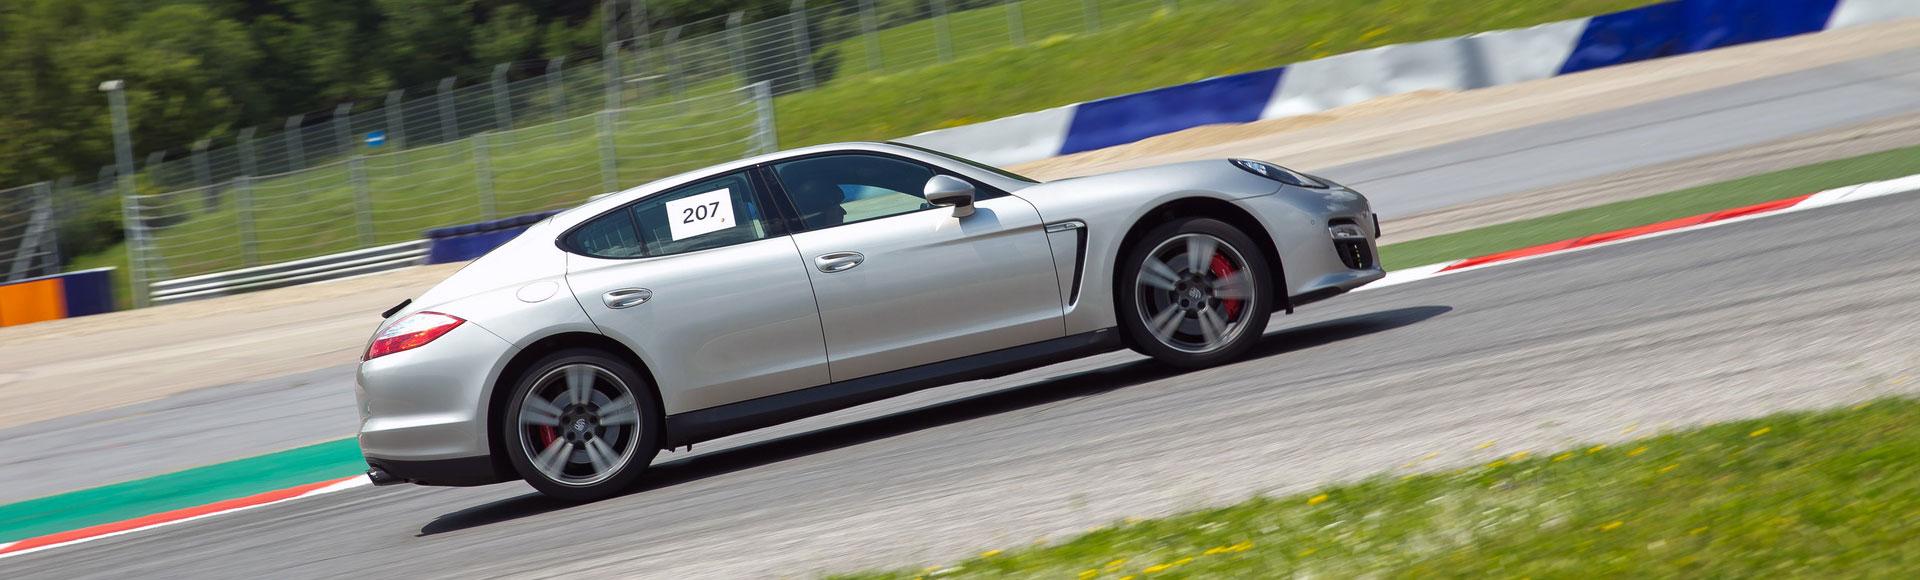 Porsche Panamera 2012 Sommer 1622